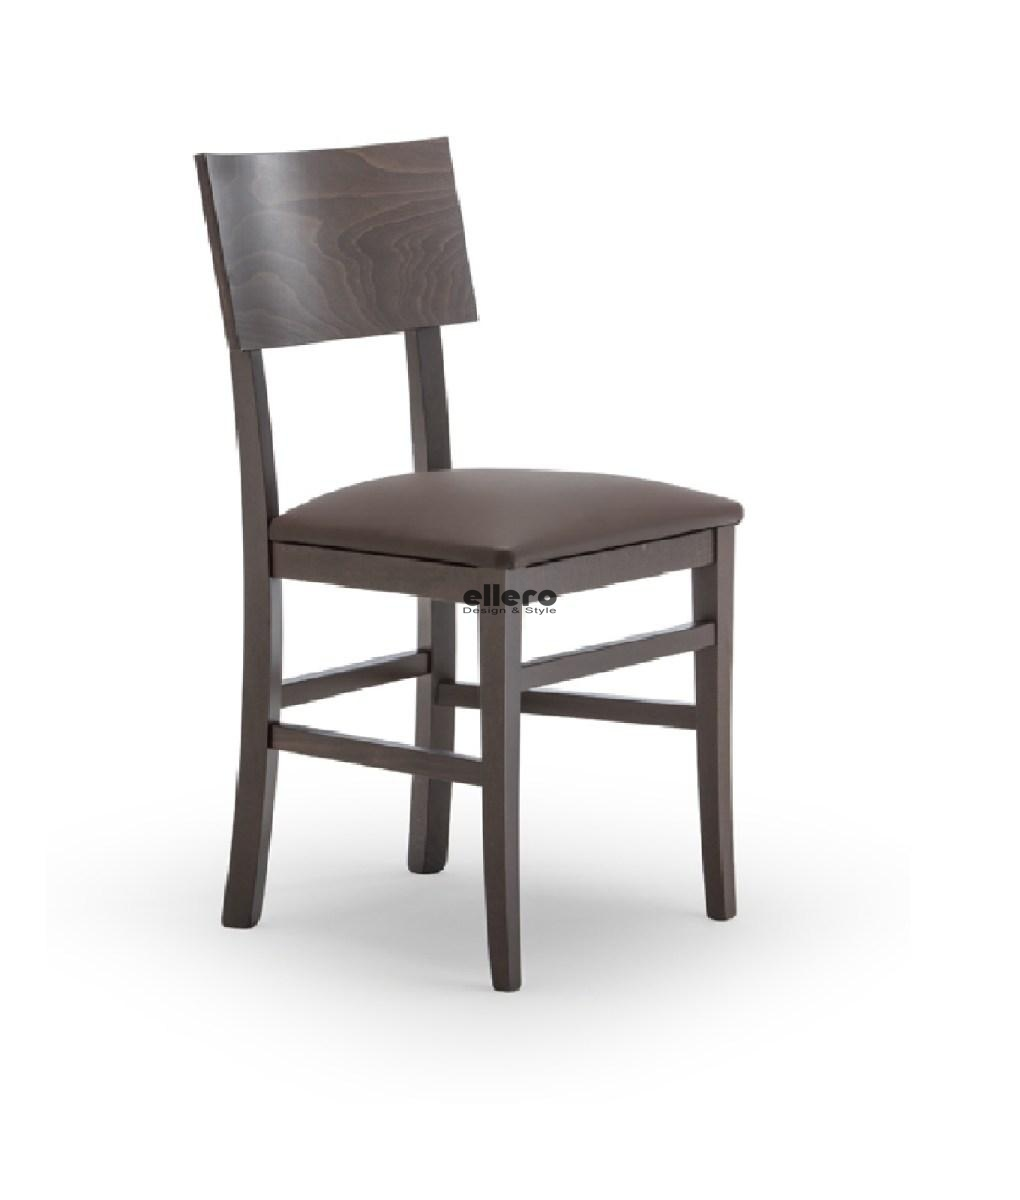 Ellero Sedie Manzano.Chairs Darko